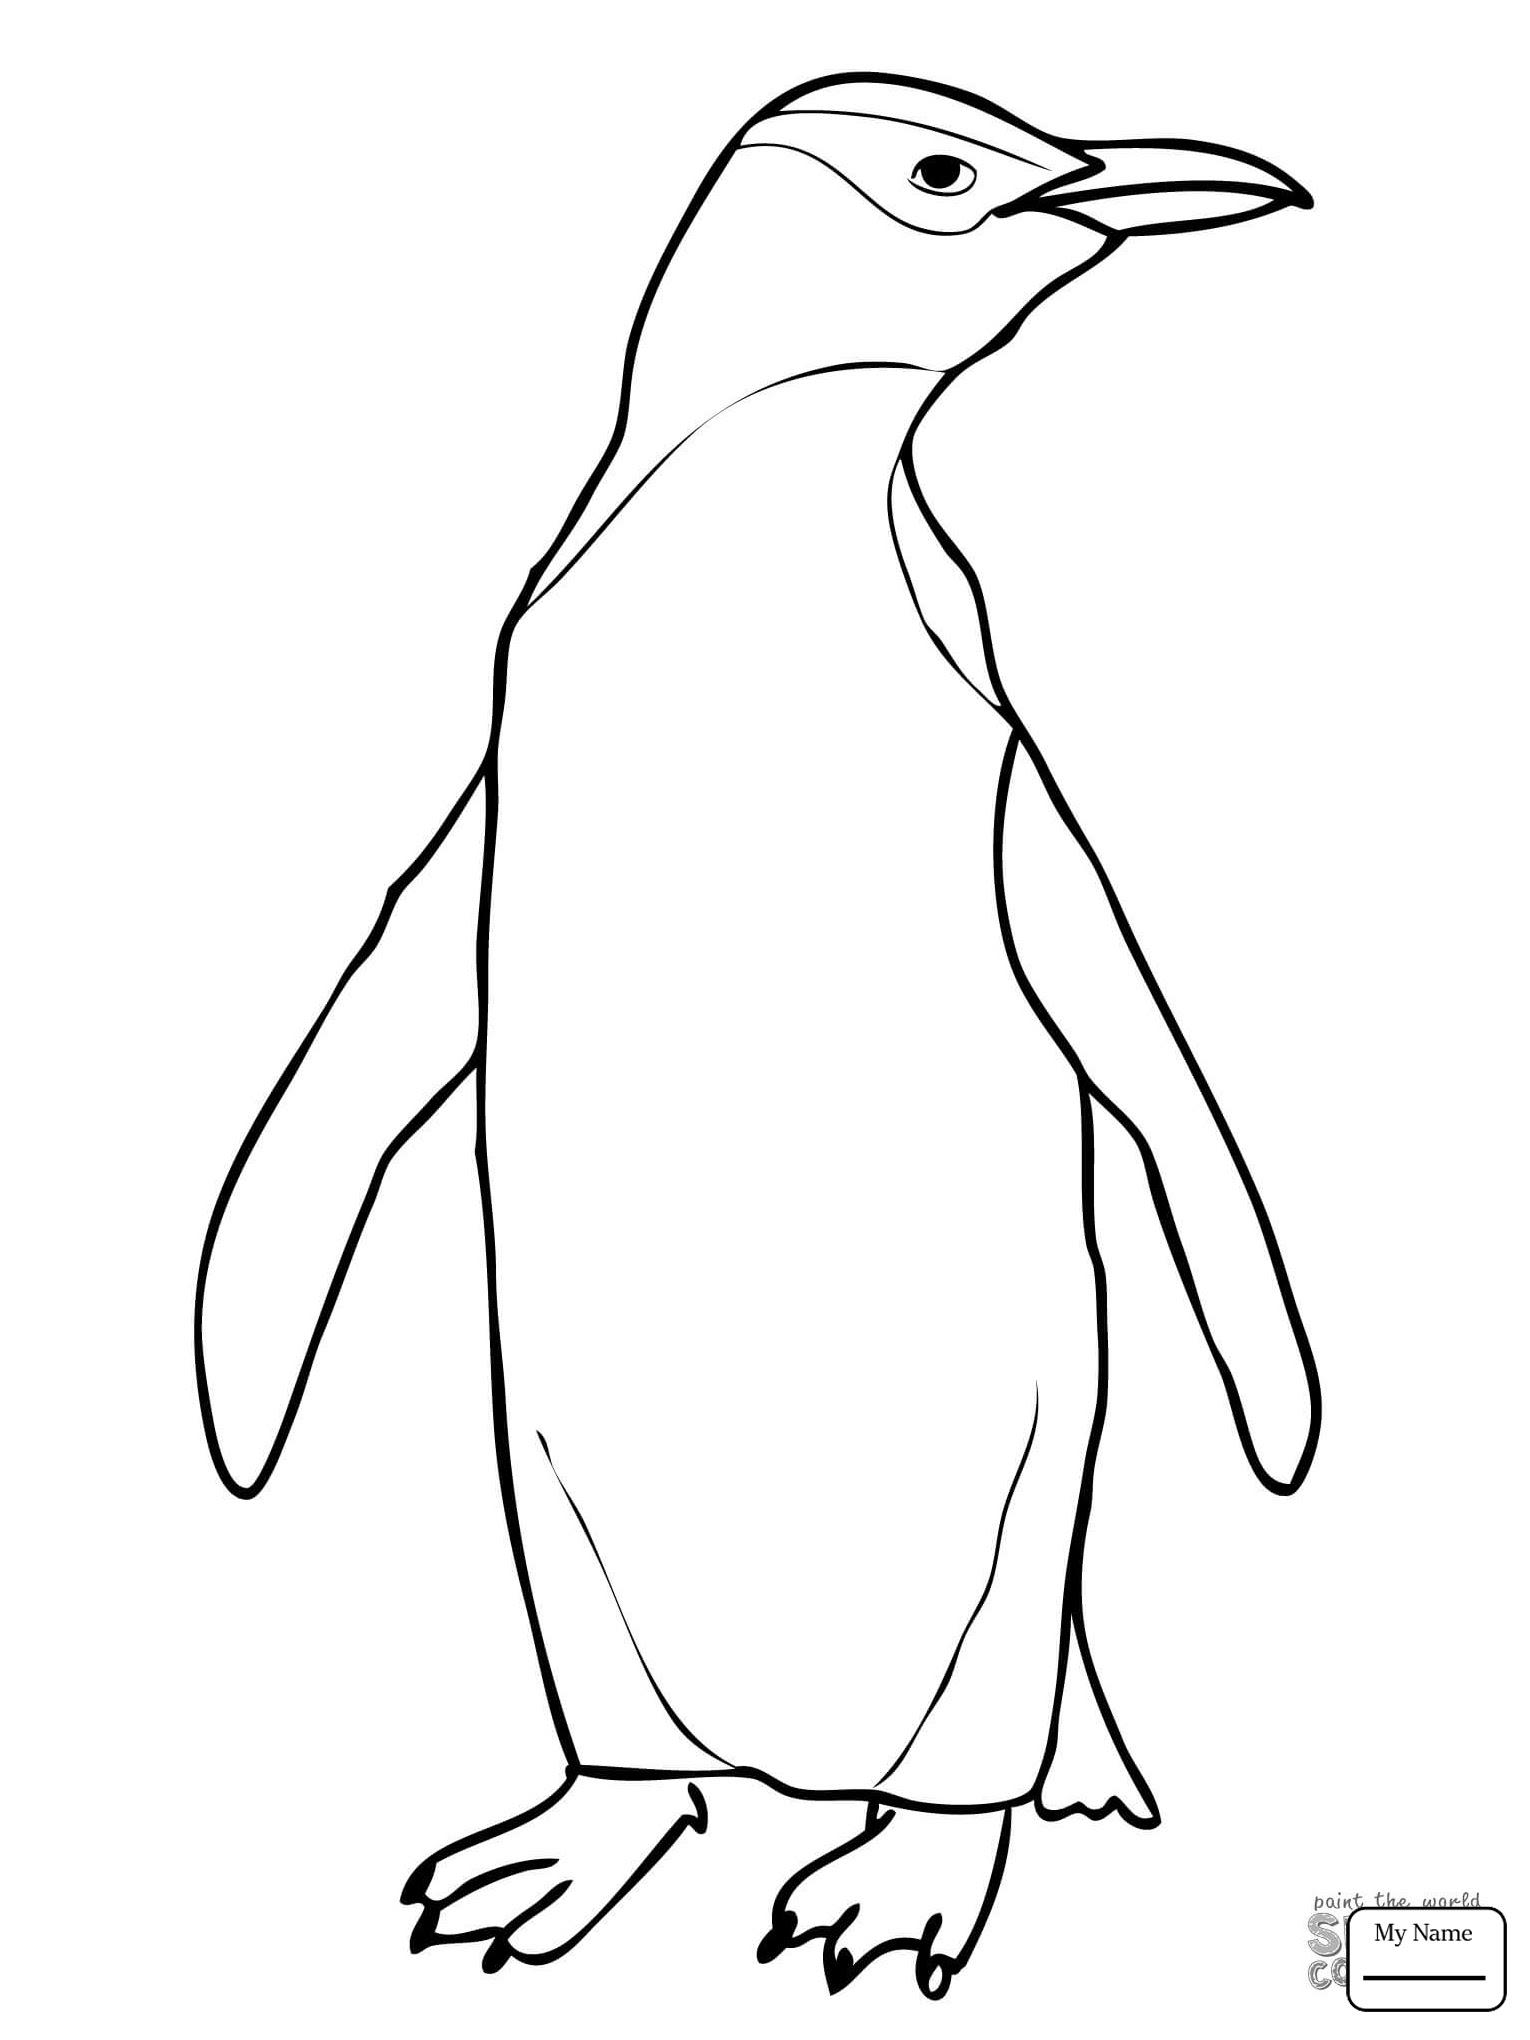 Ausmalbild Pinguin Familie - Cartoon-Bild